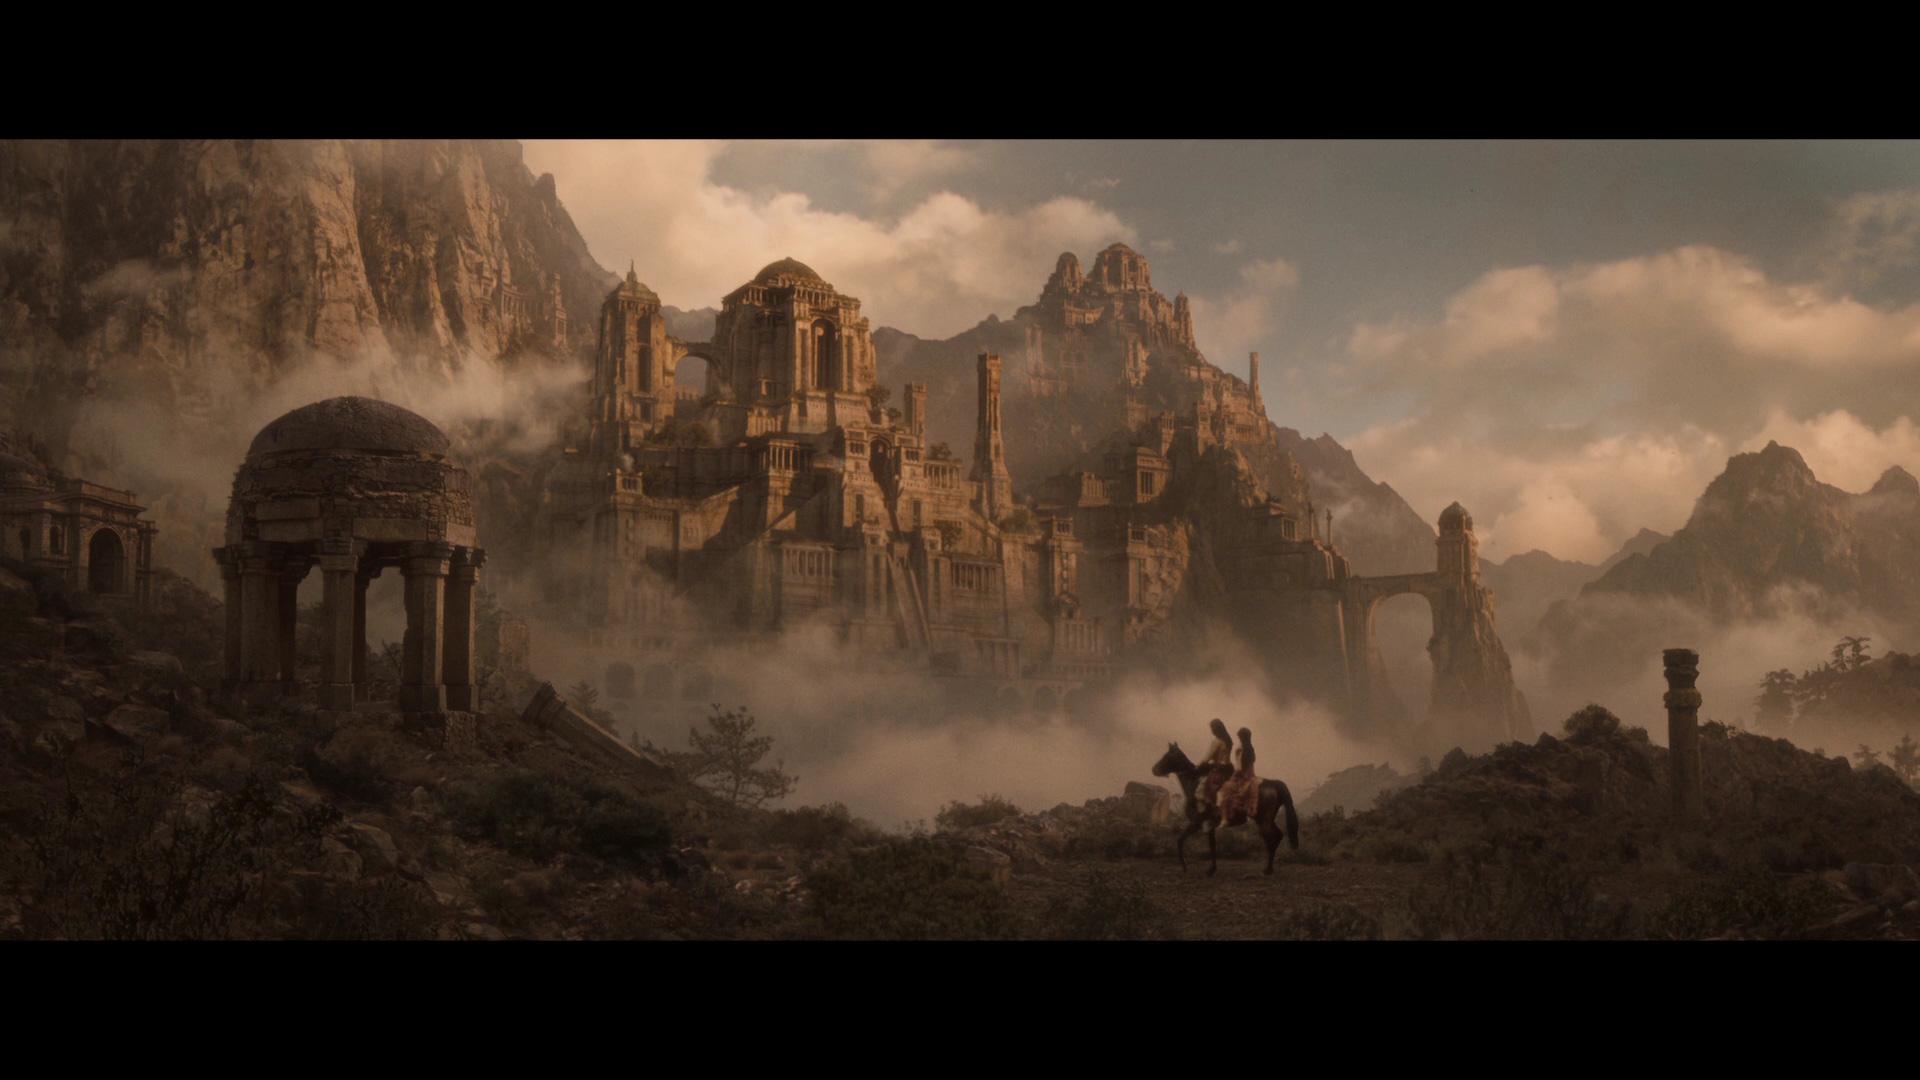 Conan hyboria castle